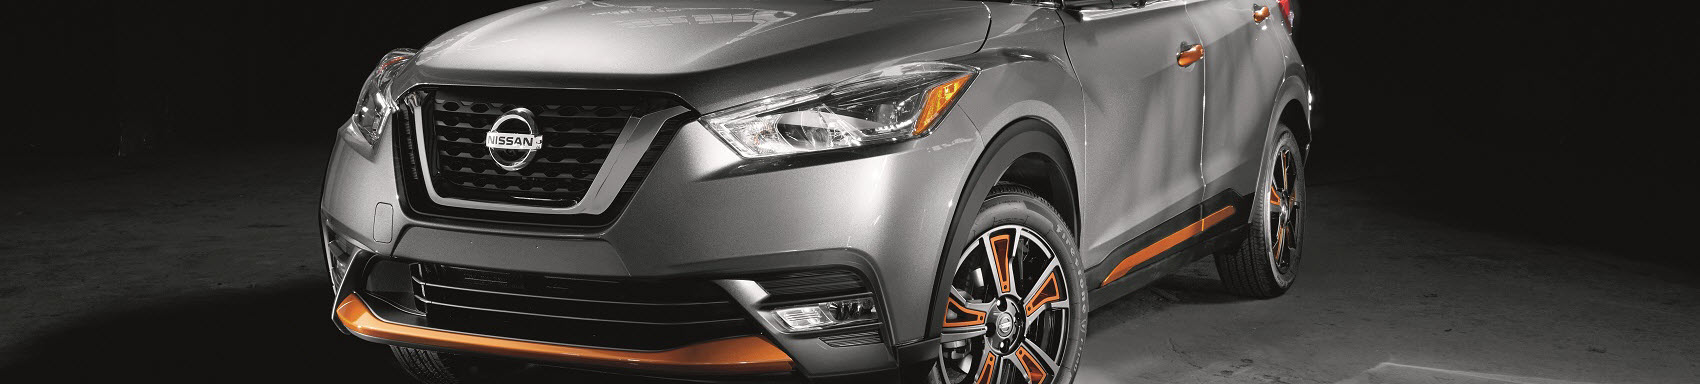 Nissan Kicks | Waycross, GA